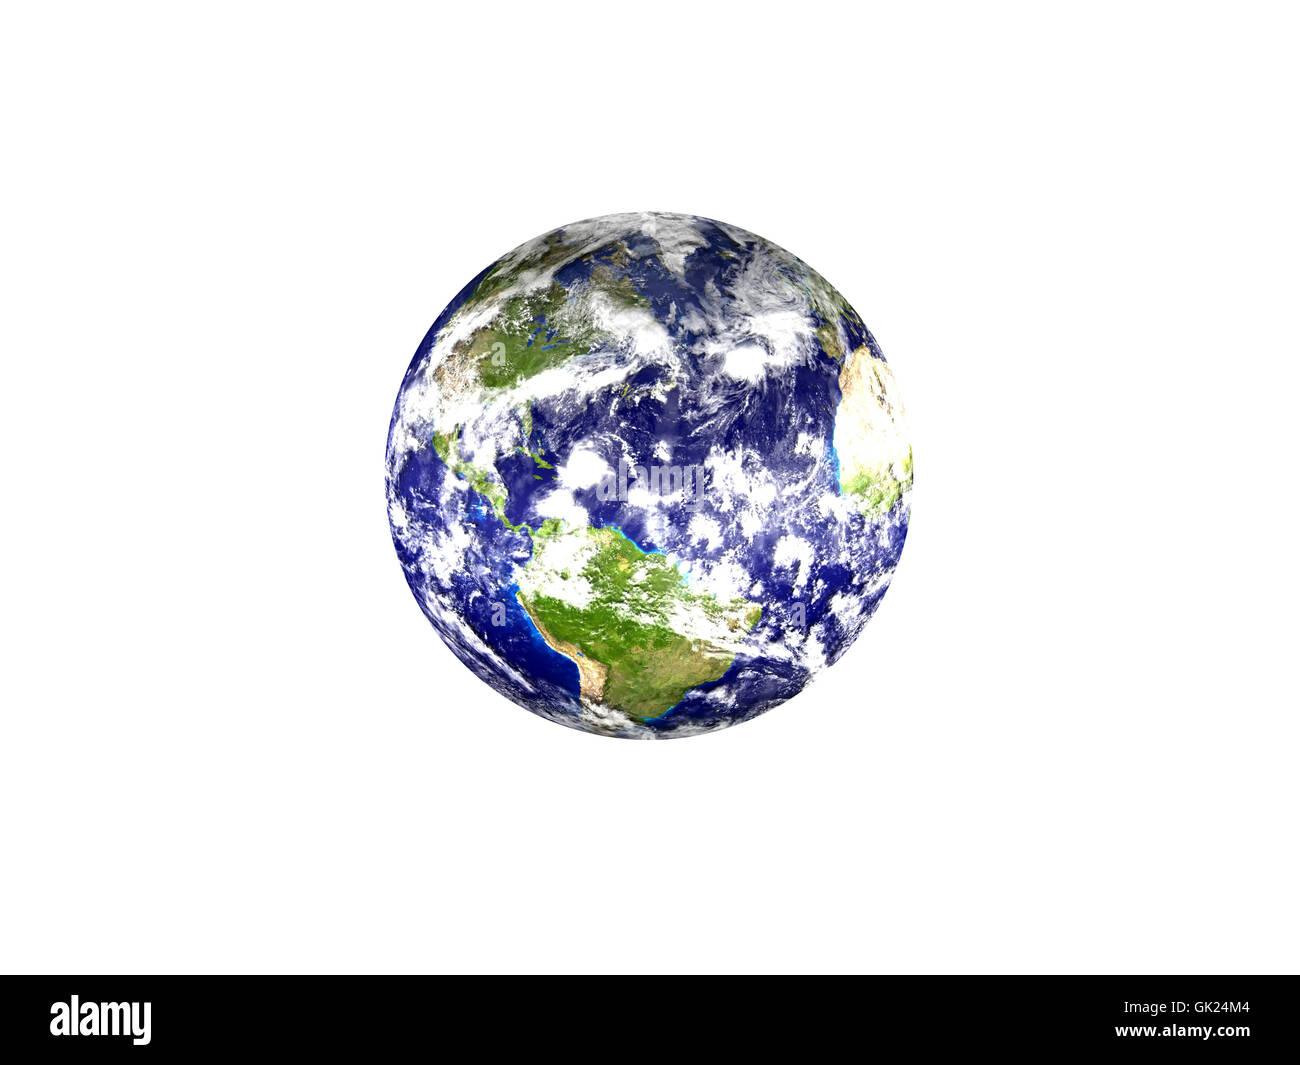 isolated usa america - Stock Image